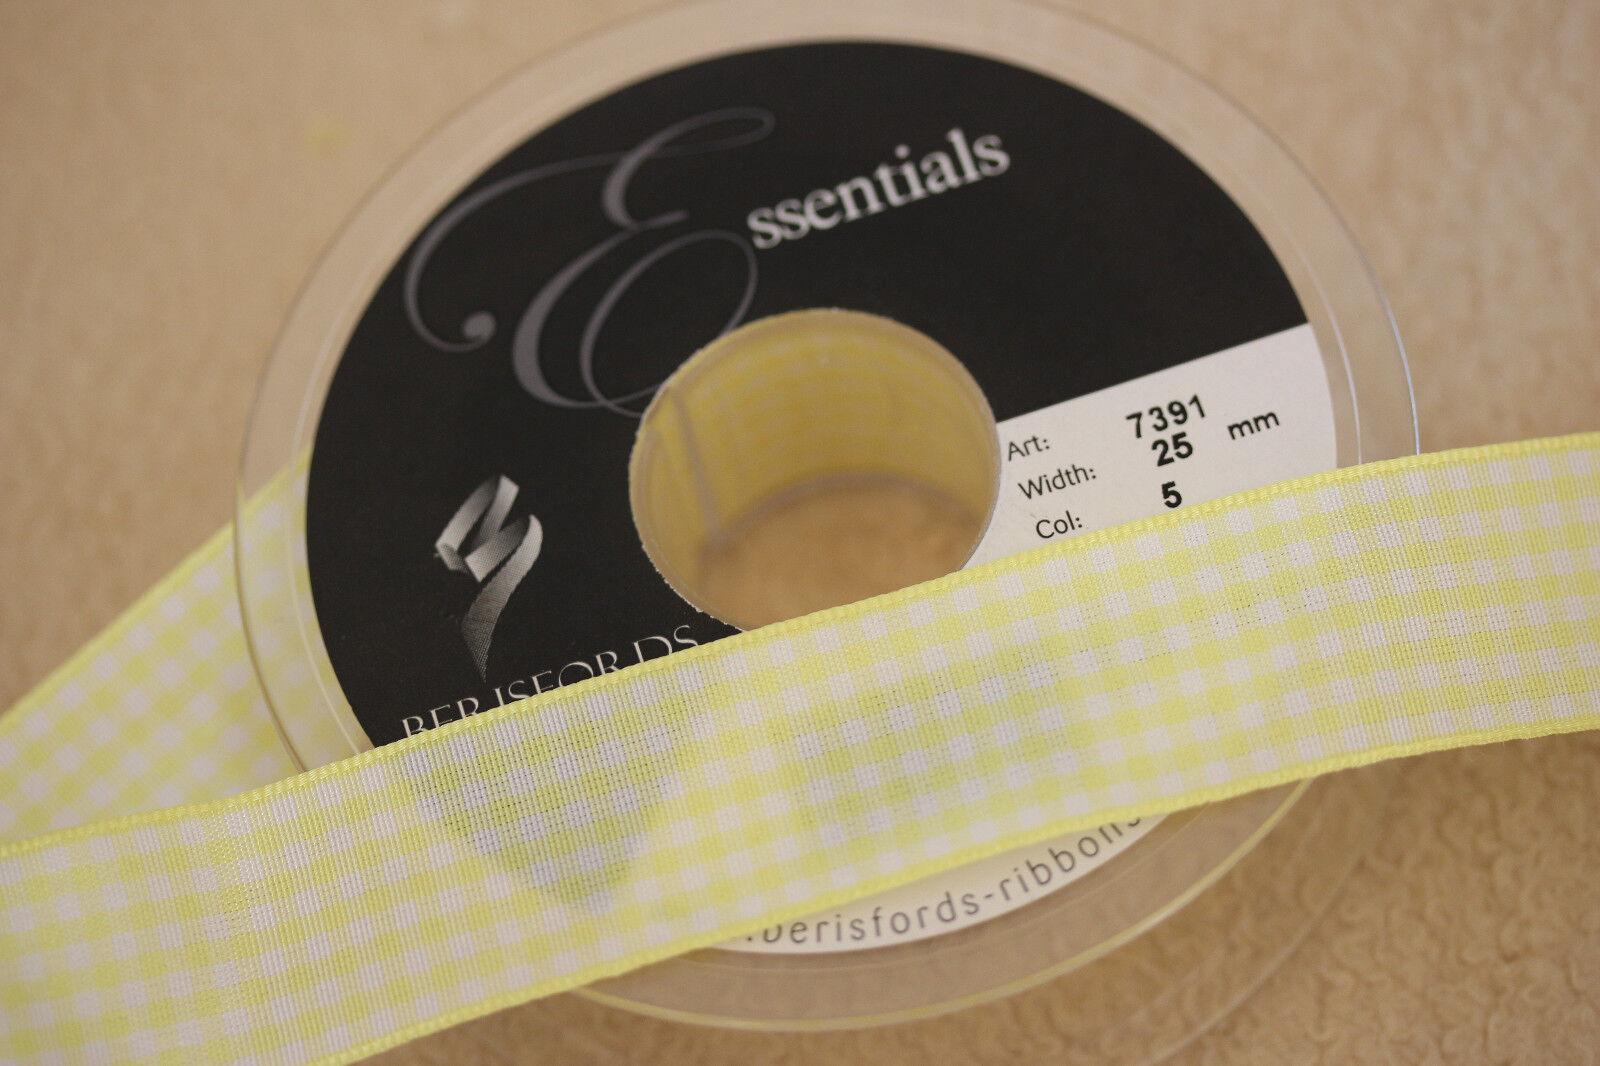 Choice of Widths ~Bows Ribbon and Lace~ Berisfords Gingham Ribbon Shade 5 Lemon